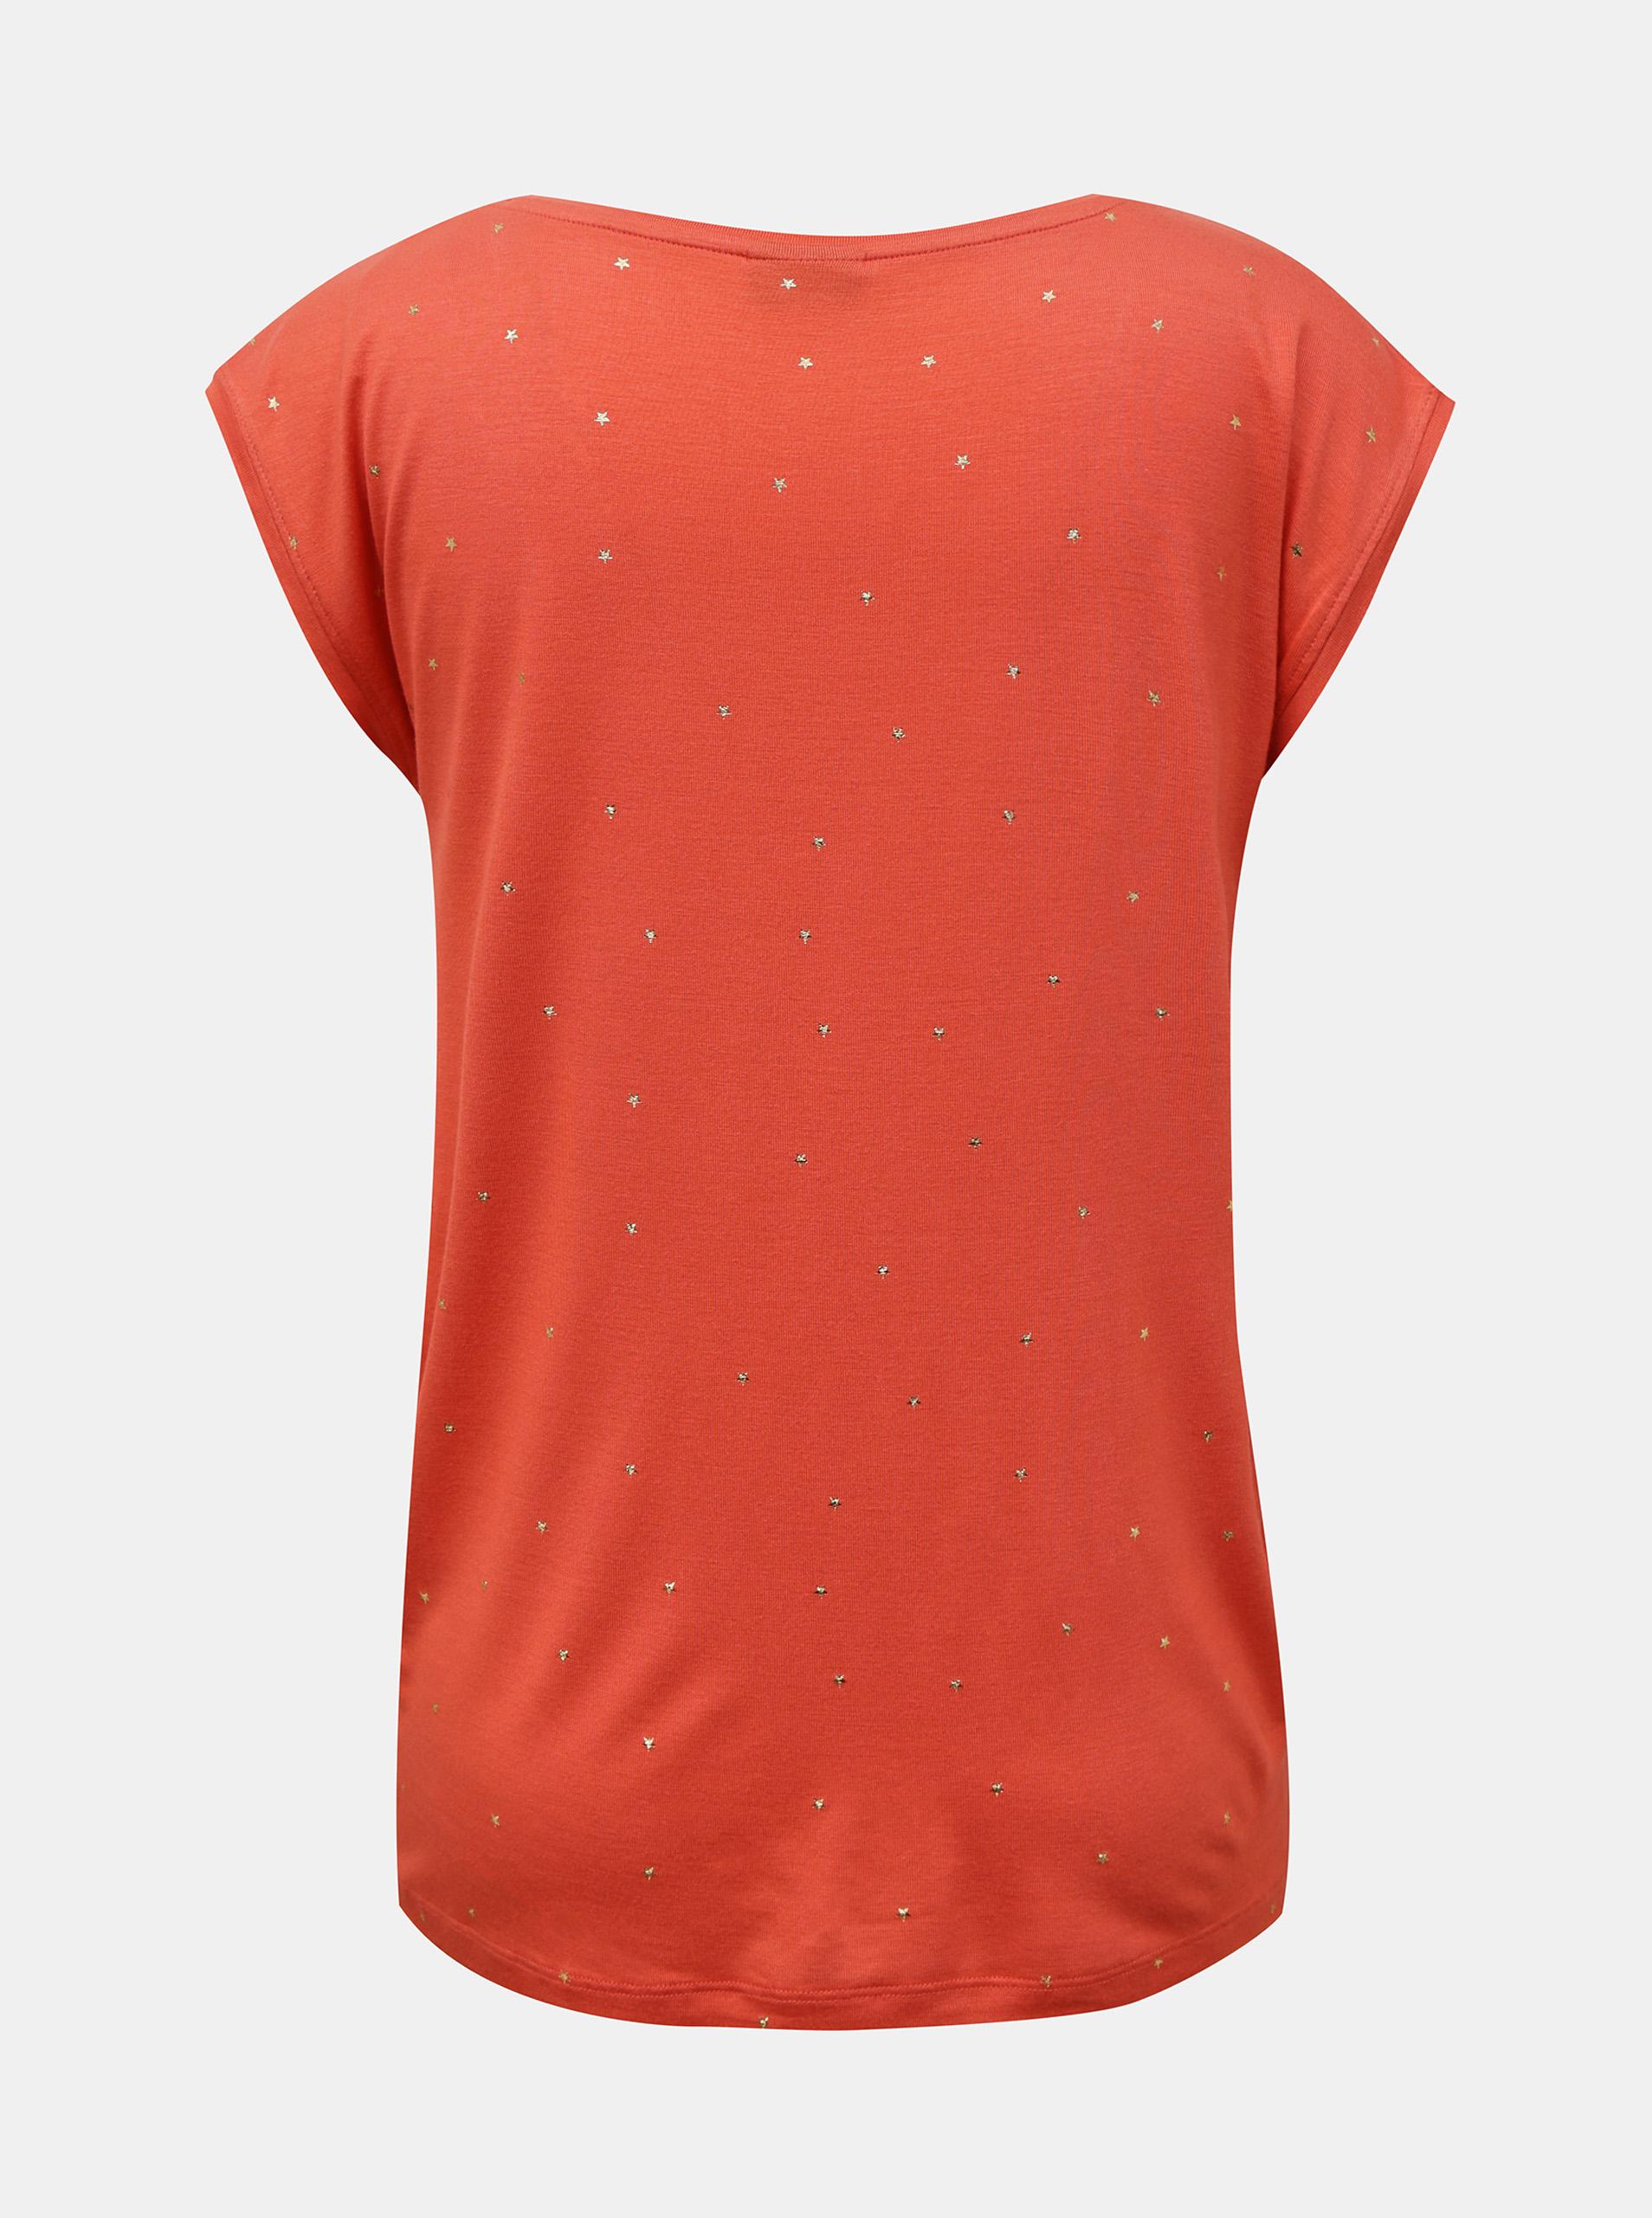 Pieces ružičasta majica Milly s uzorkom